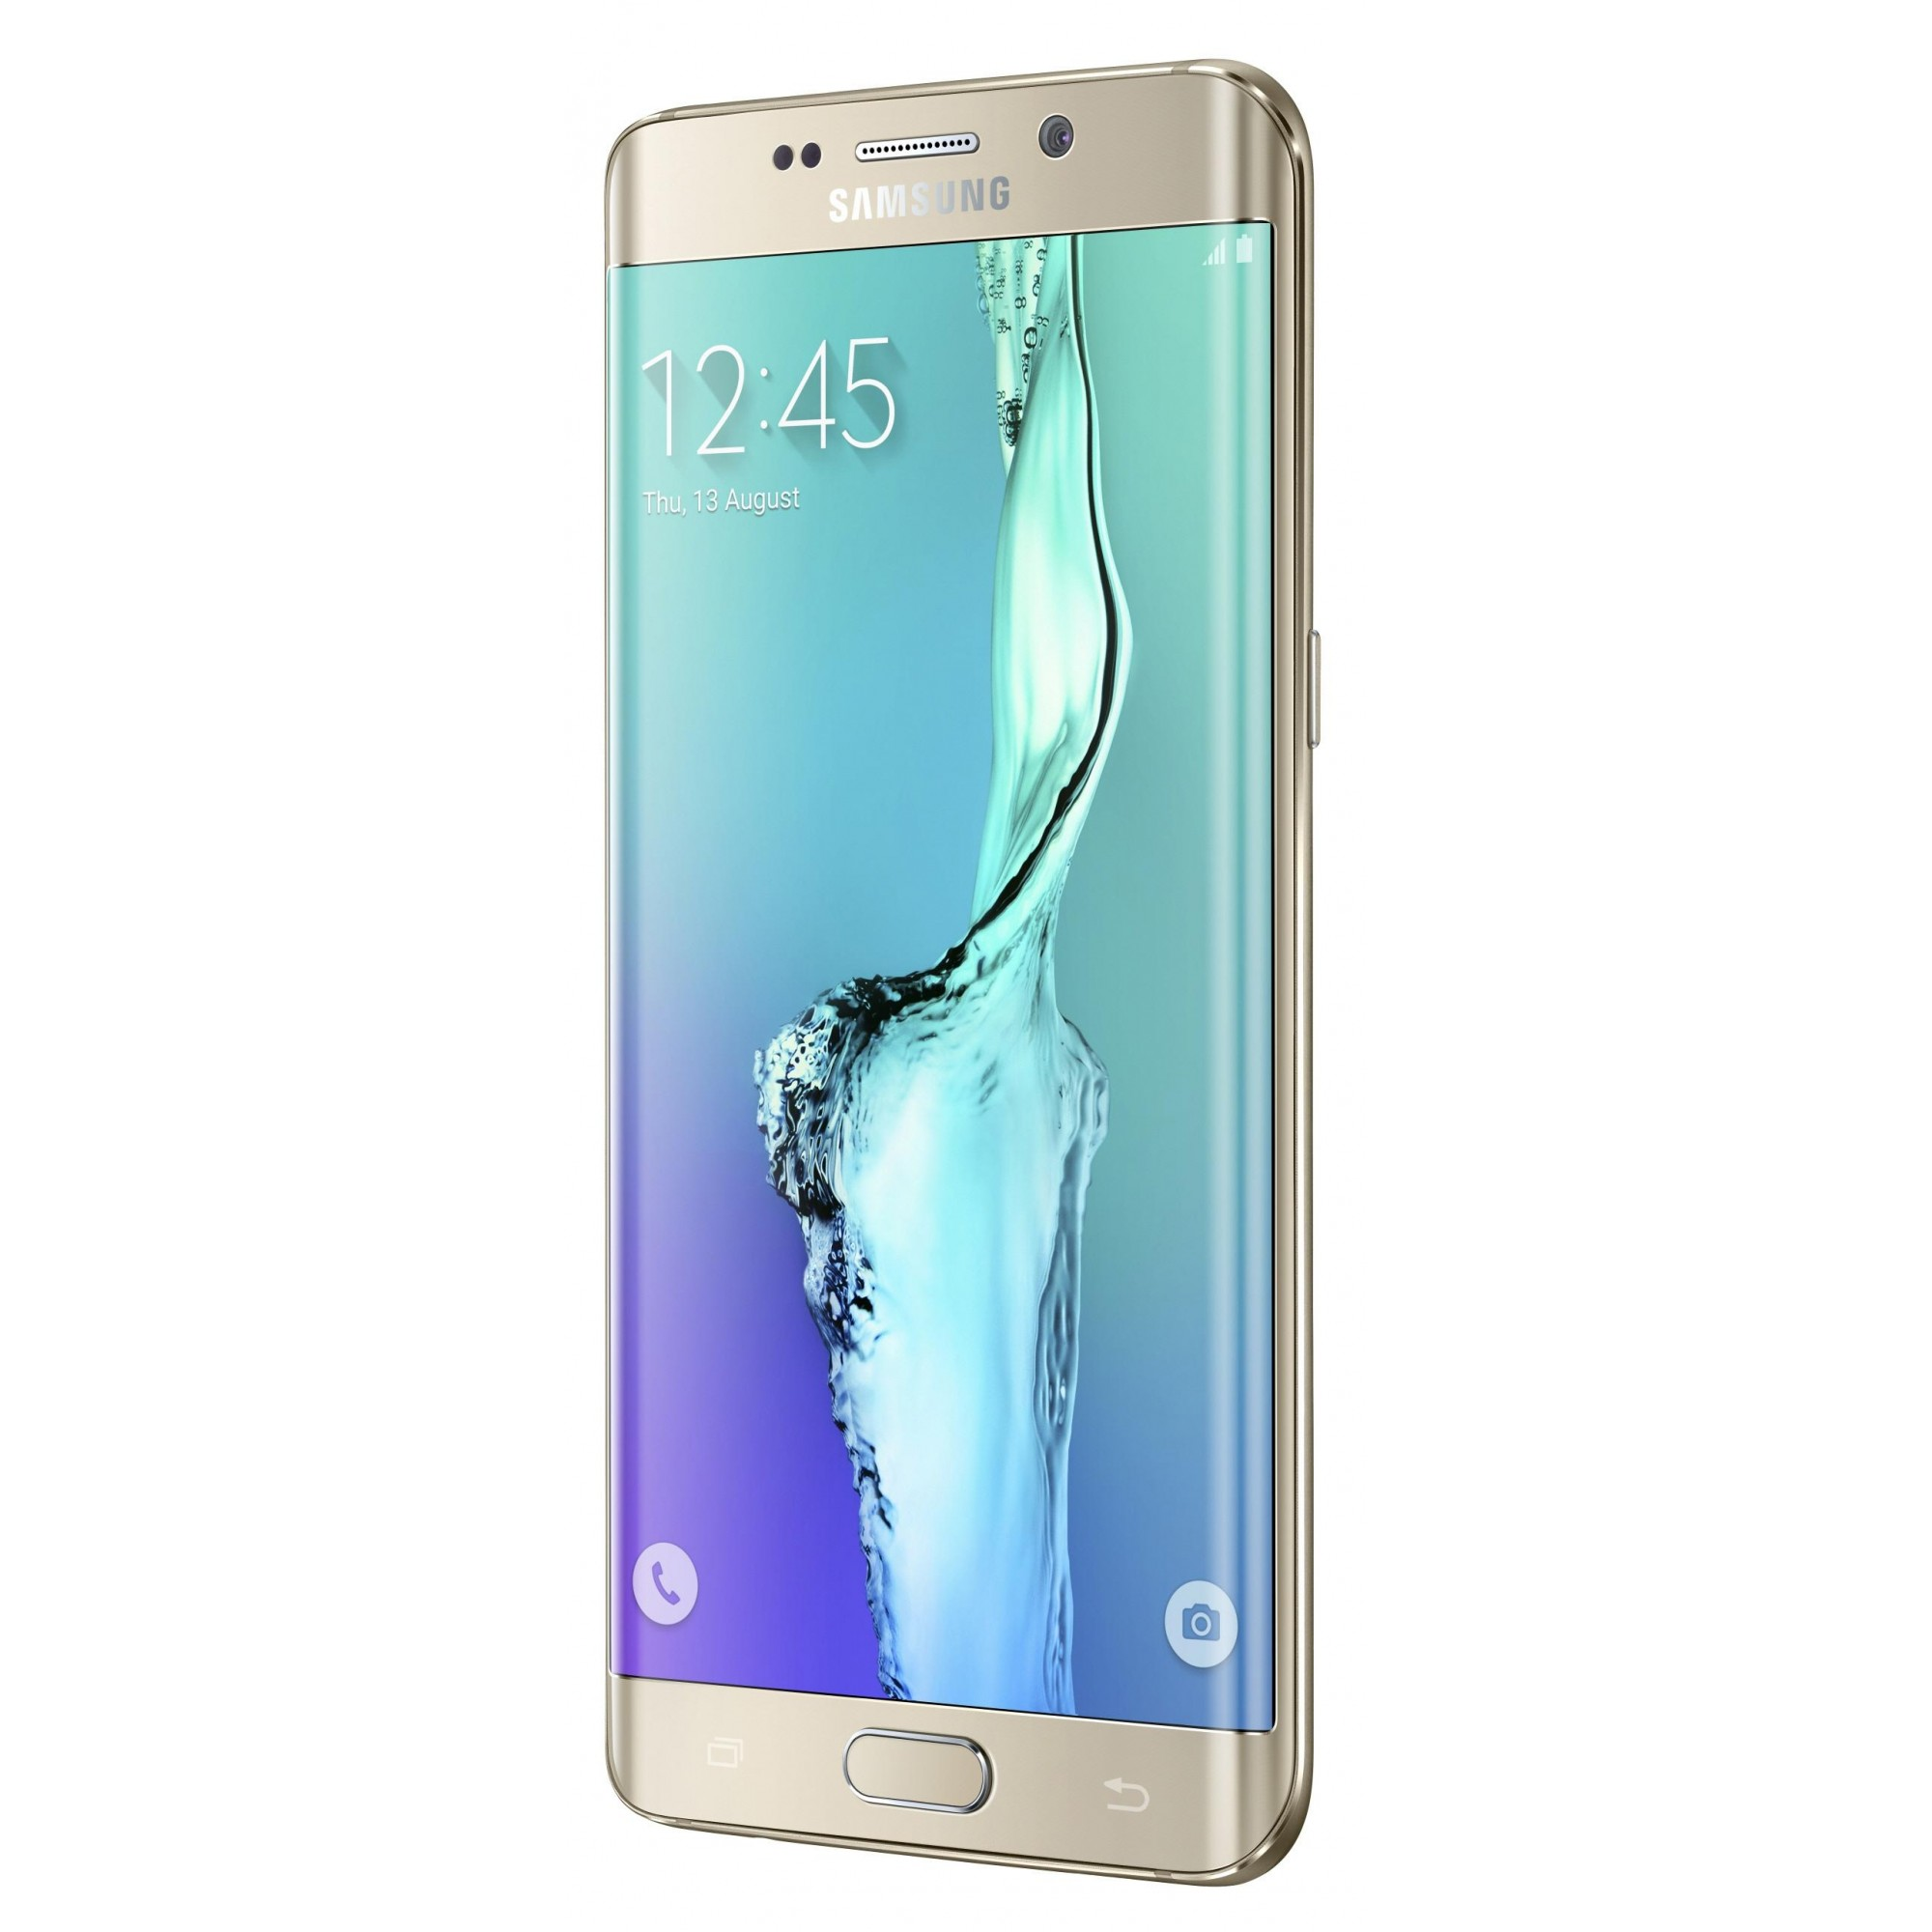 Samsung Galaxy S6 Edge Plus G9287c